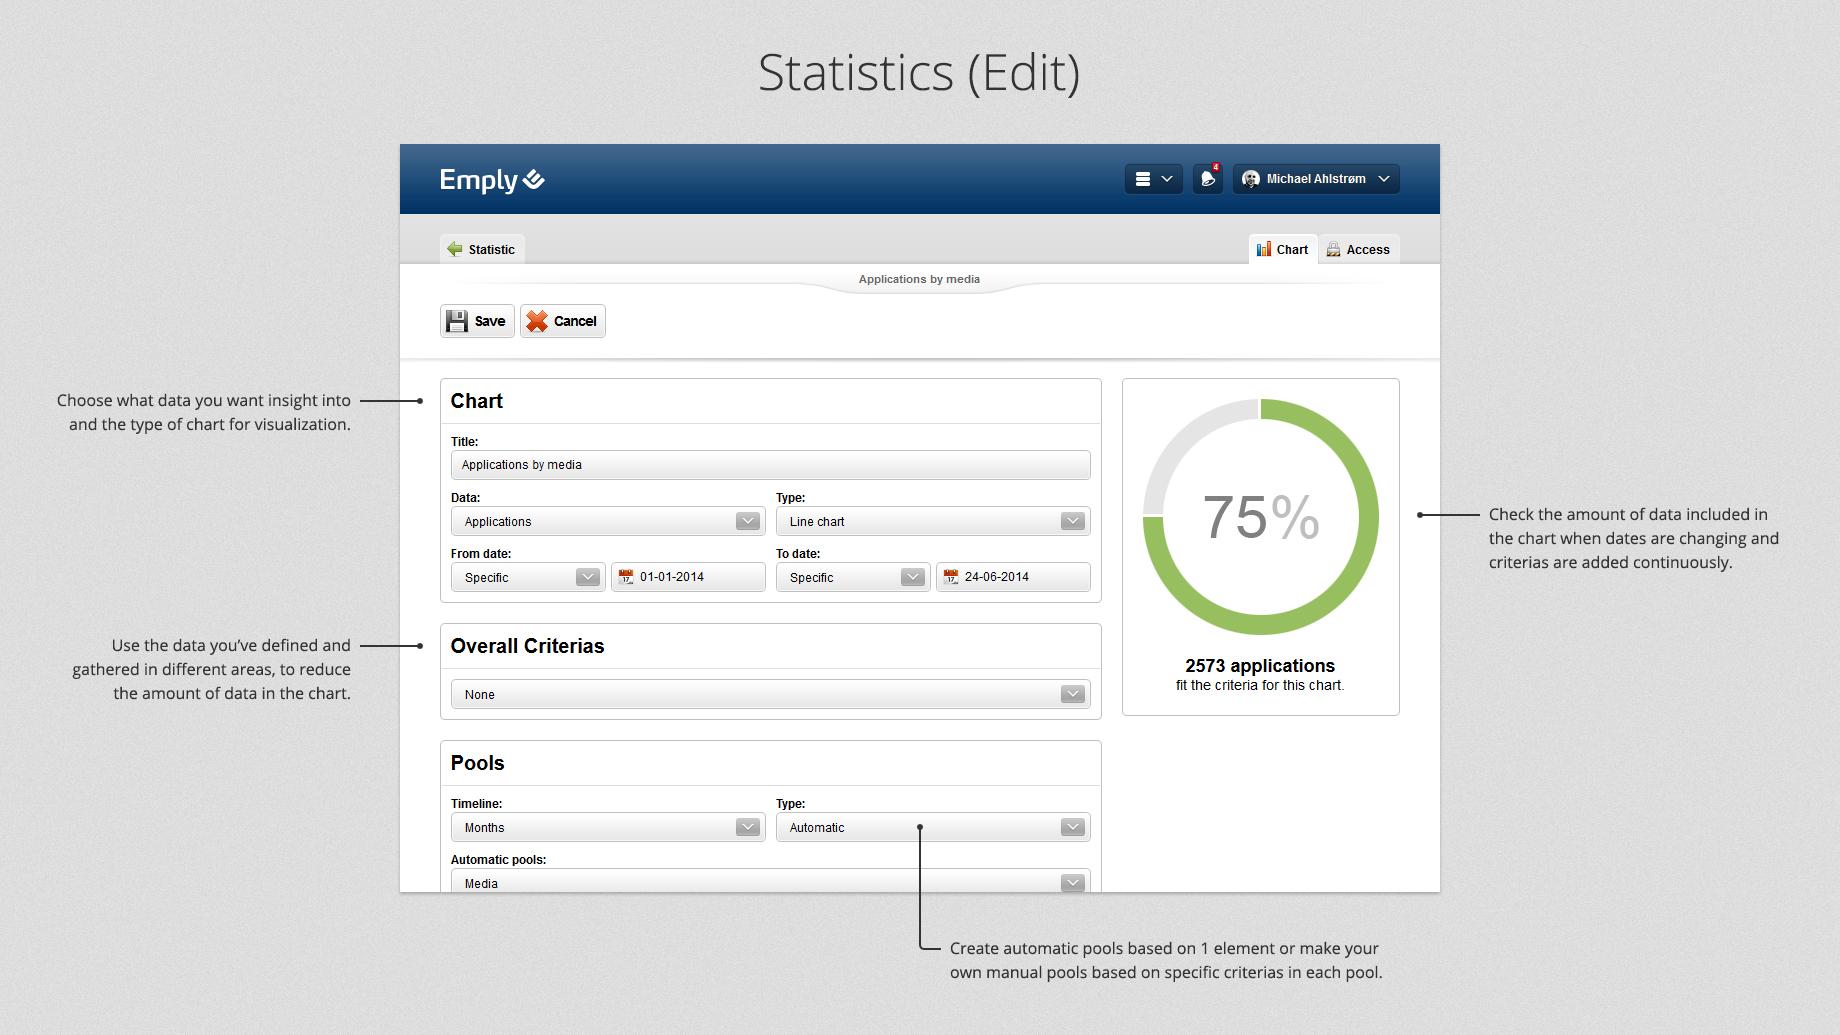 Statistics (Edit)